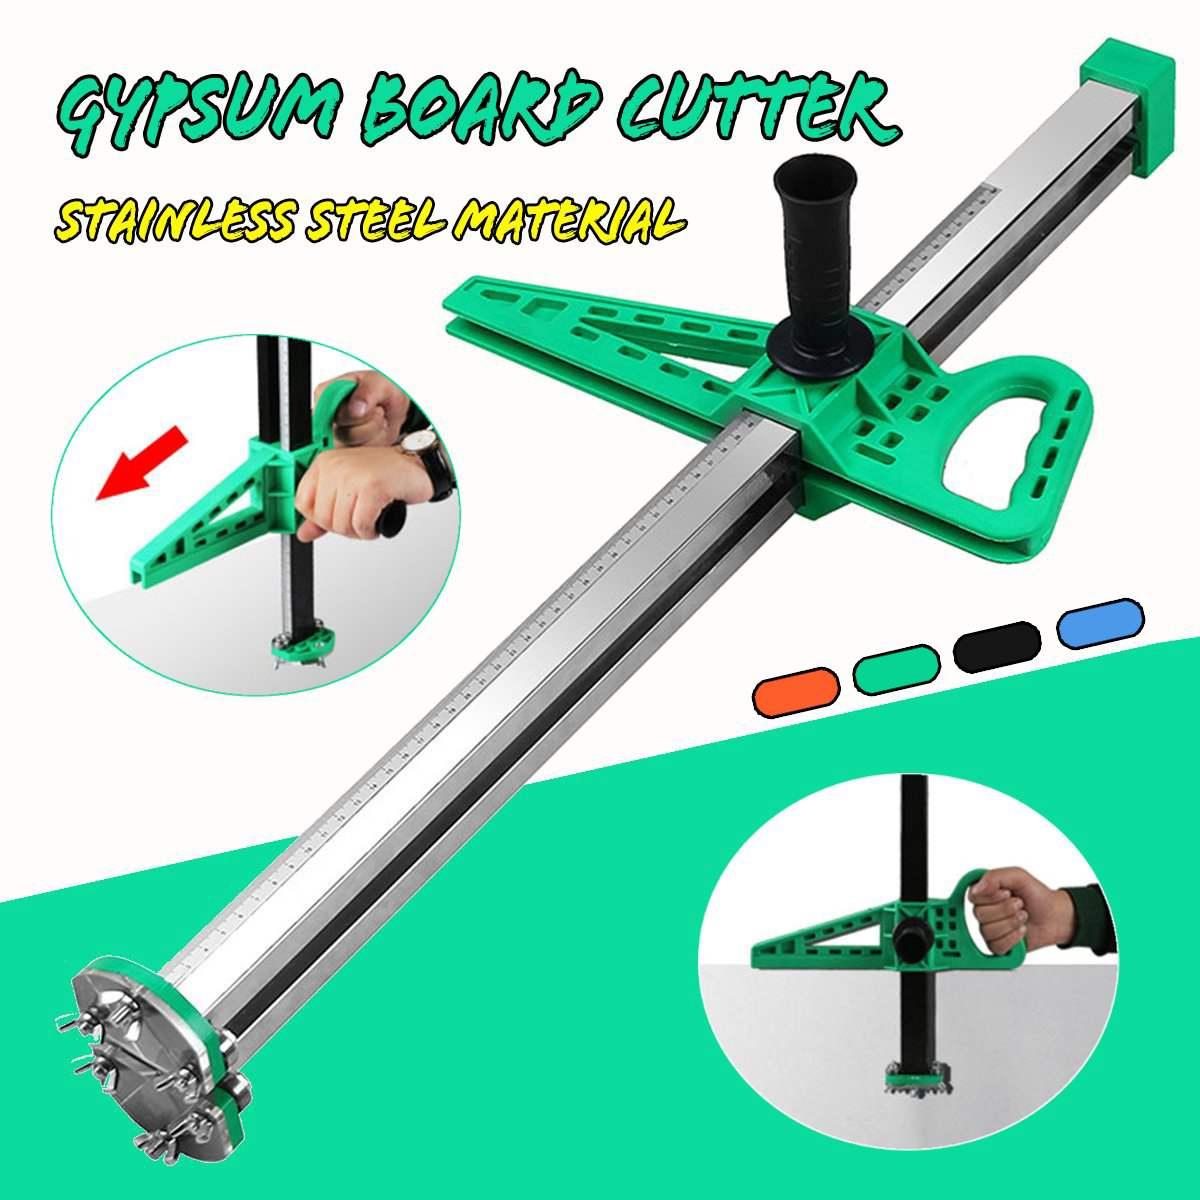 20-600mm Manual Gypsum Board Cutter Hand Push Drywall Artifact Tool Woodworking Cutting Board Tools Orange/Green/Black